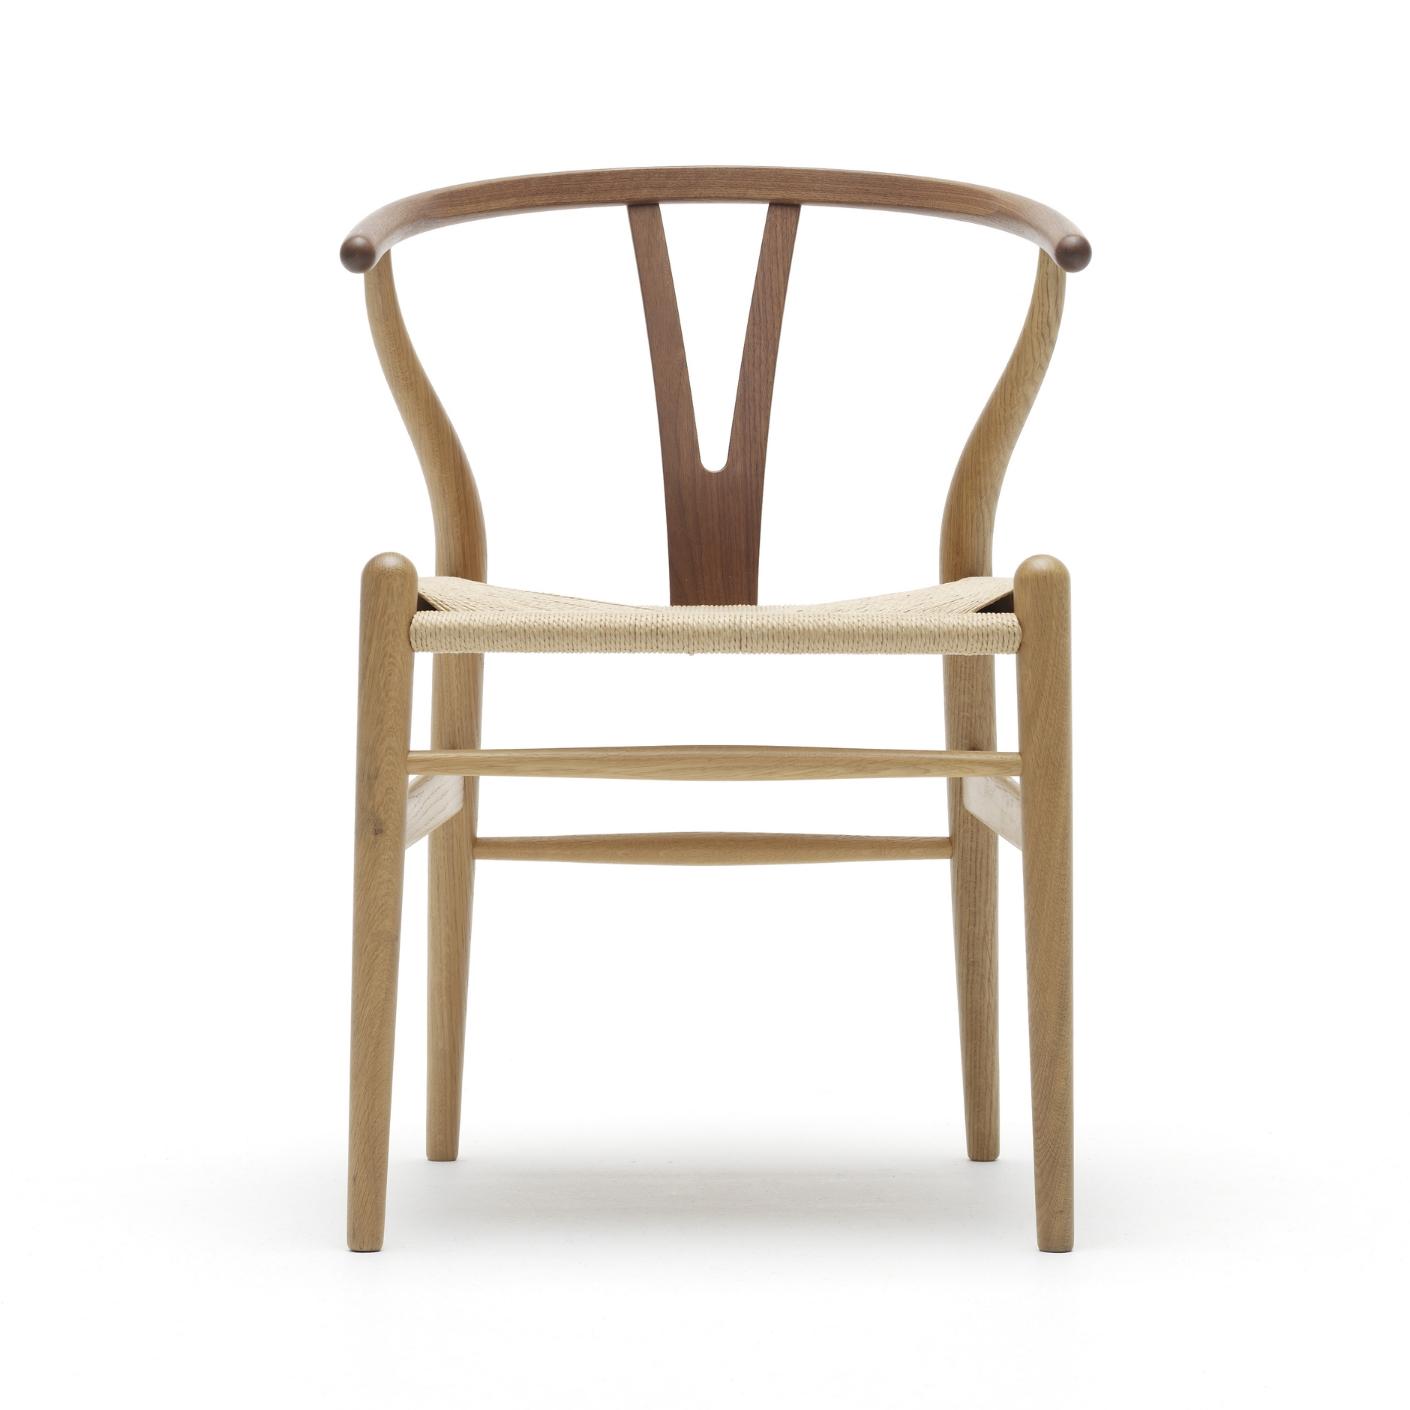 "Carl Hansen & Søn ""Wishbone Chair"" CH24 ontworpen door Hans J. Wegner"